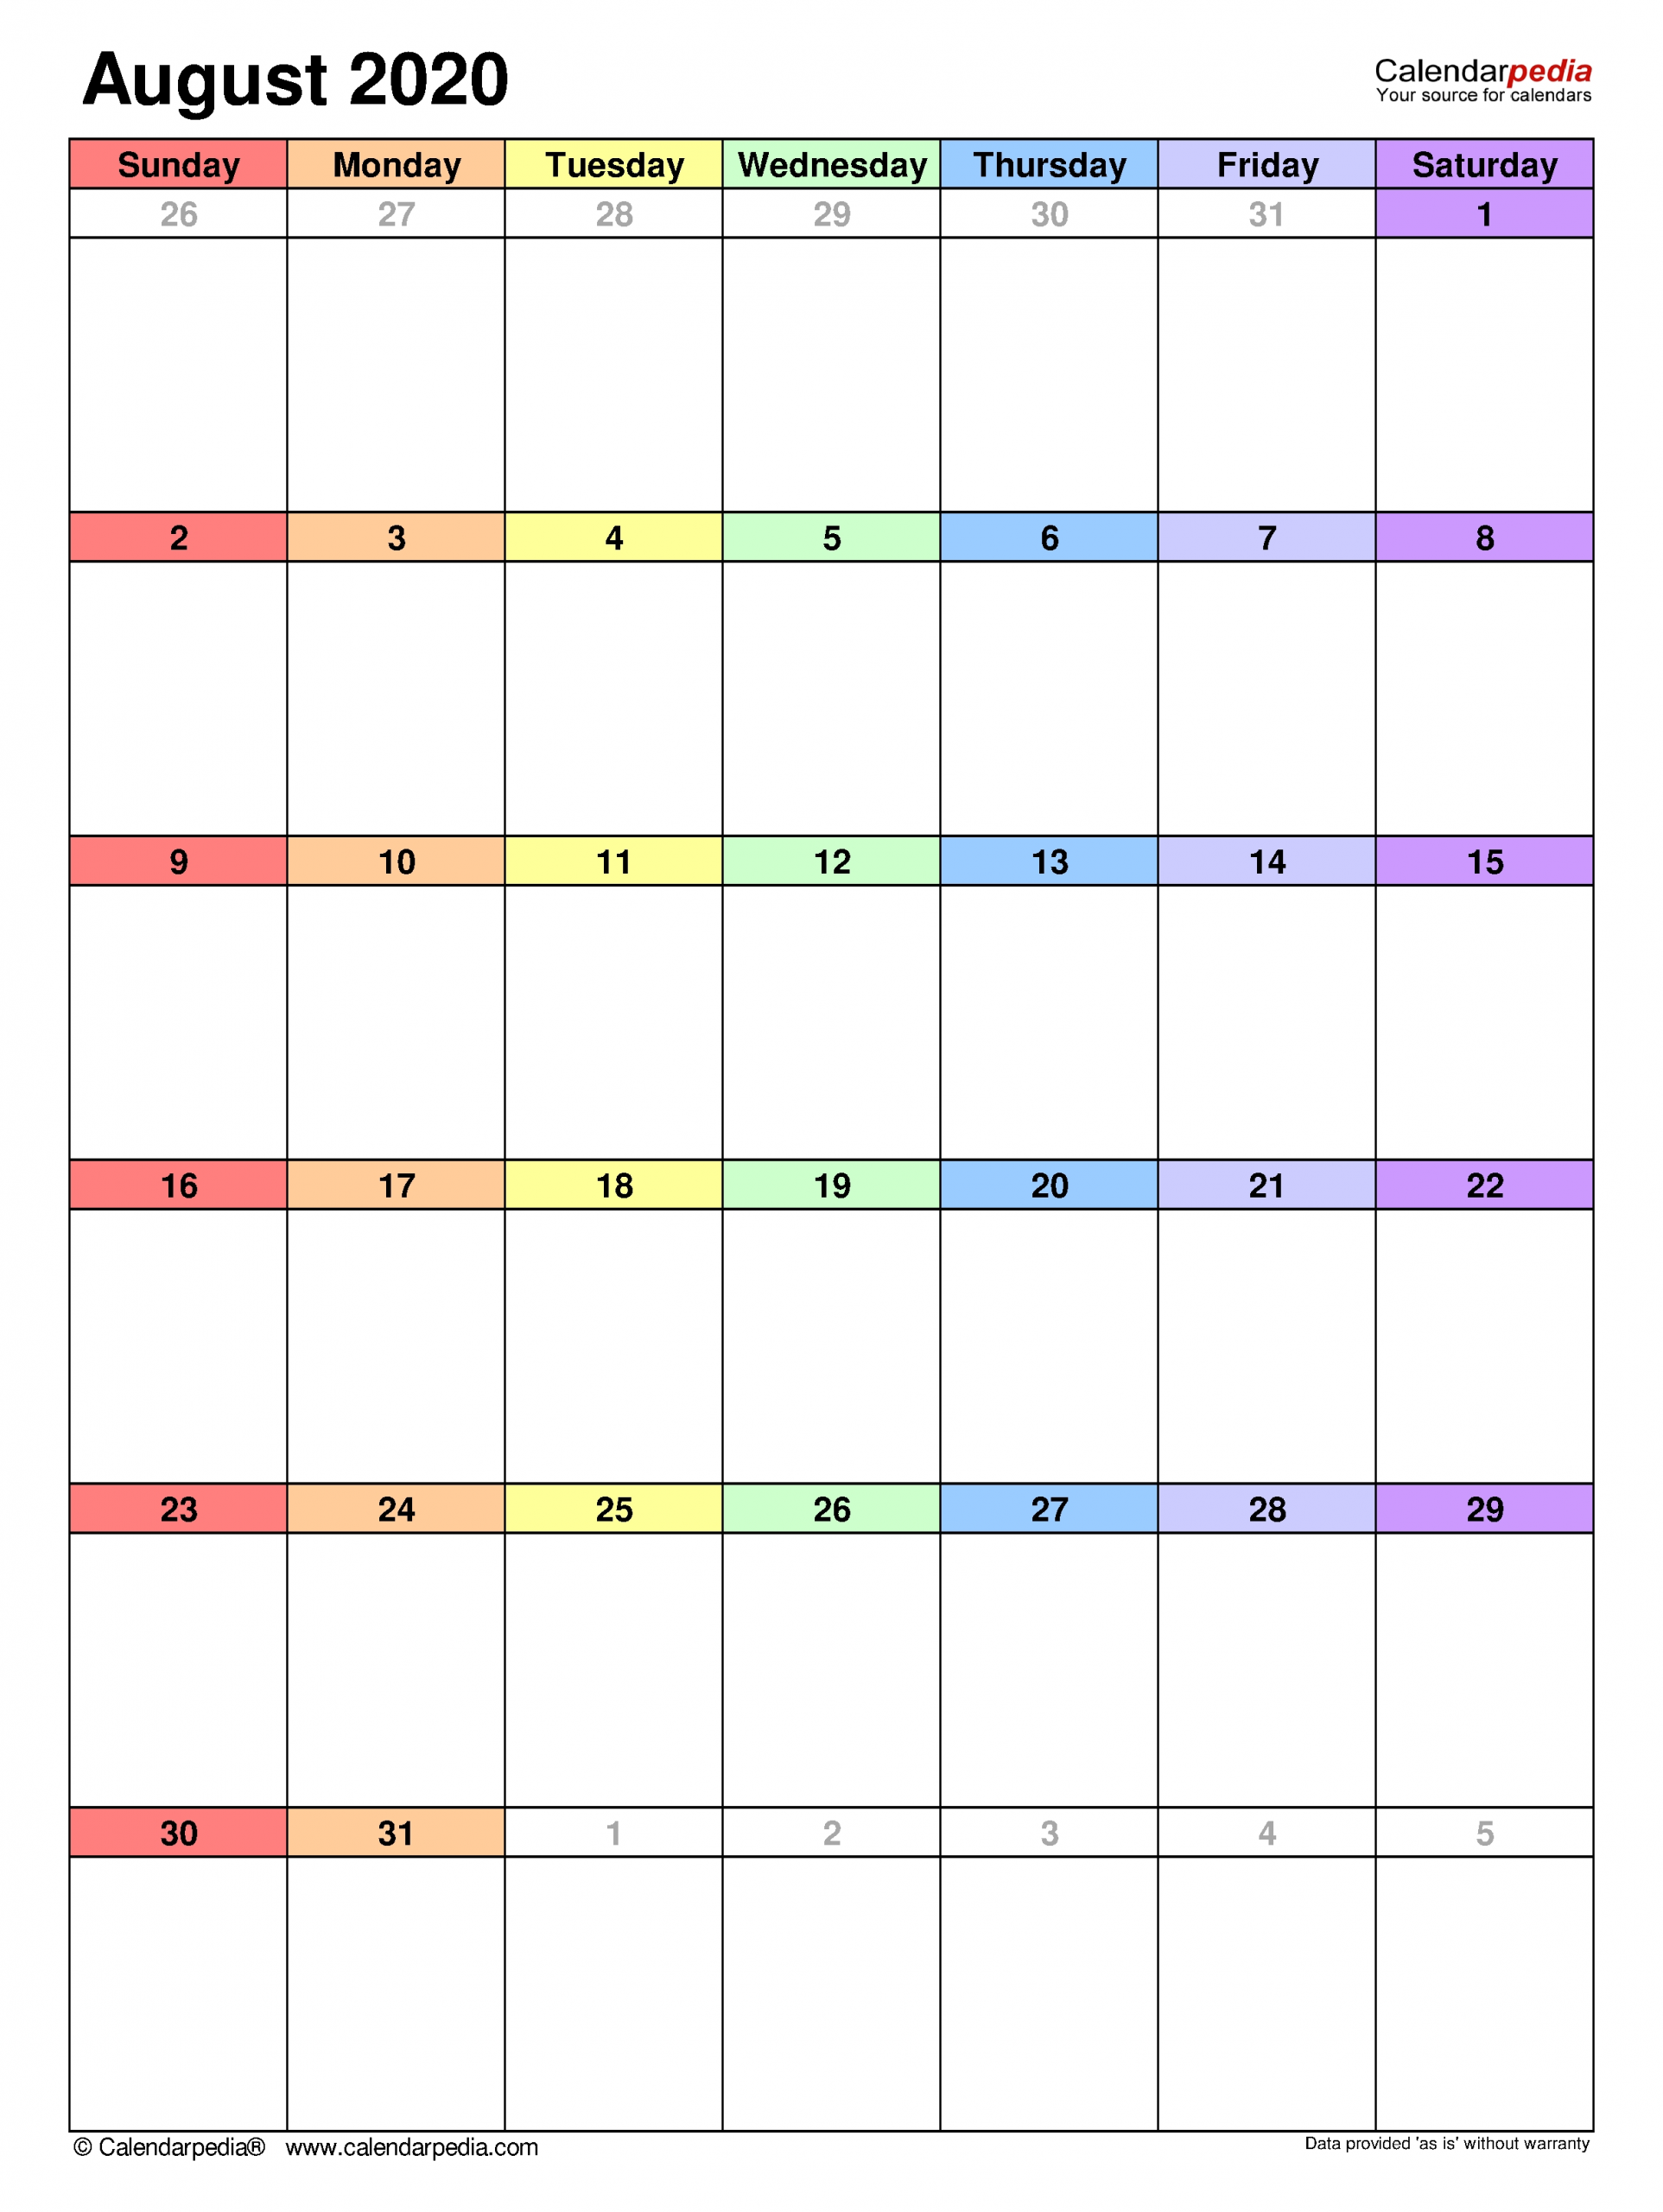 Get August Monthly Calendar Landscaoe